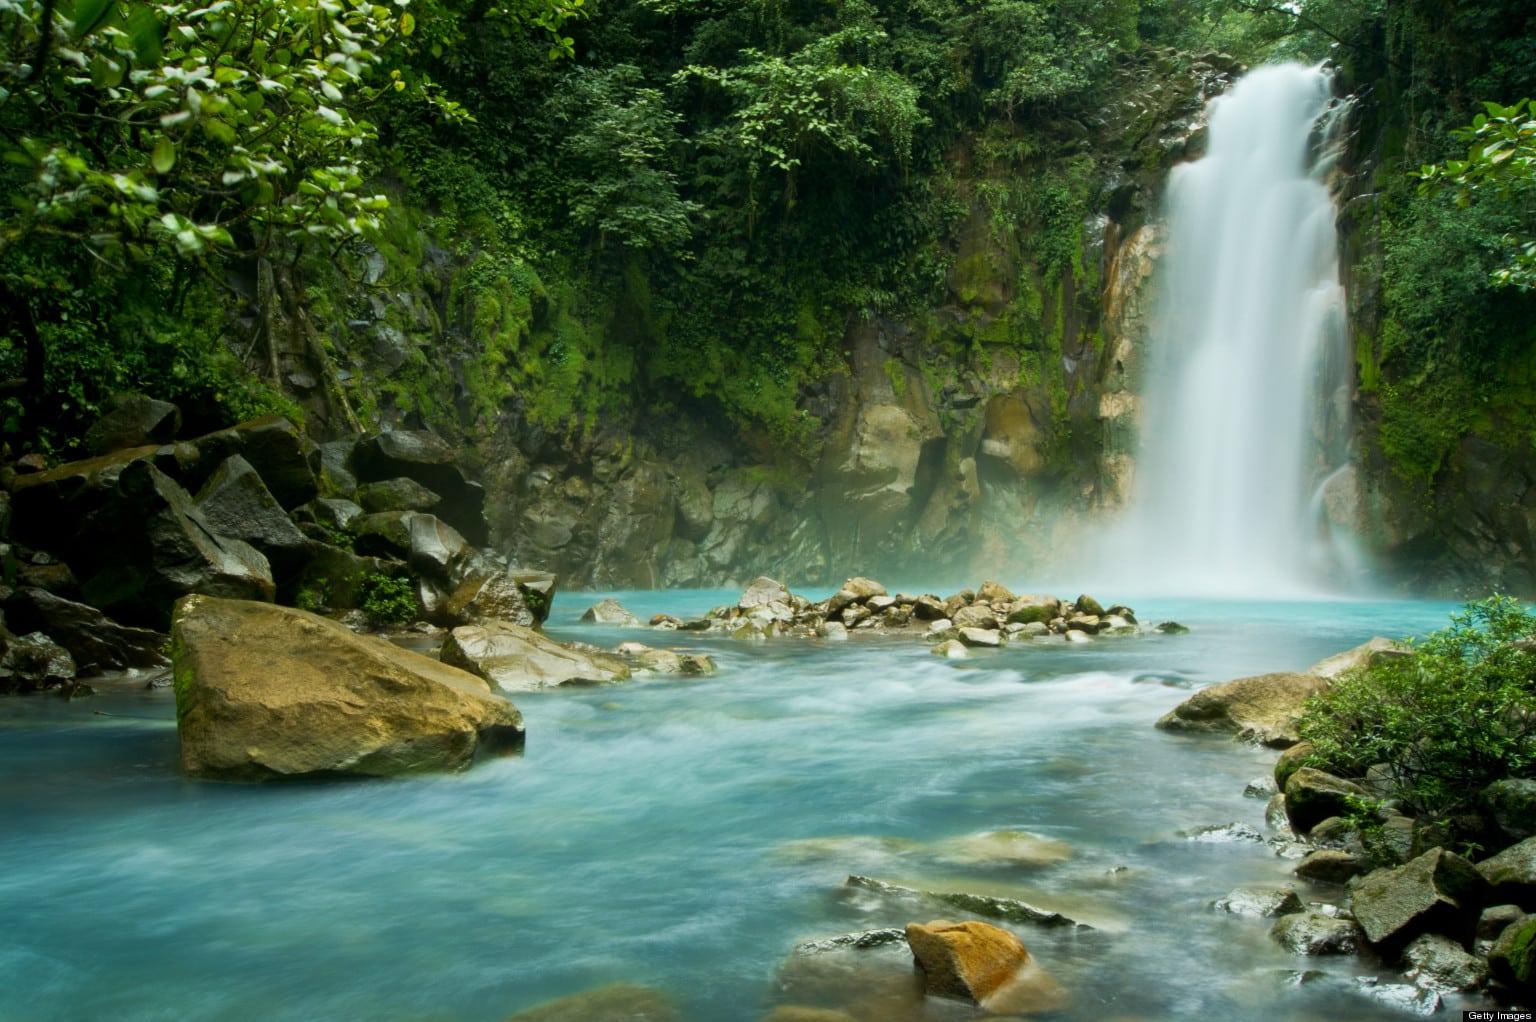 Sistema de energía 99% renovable de Costa Rica inspira al mundo